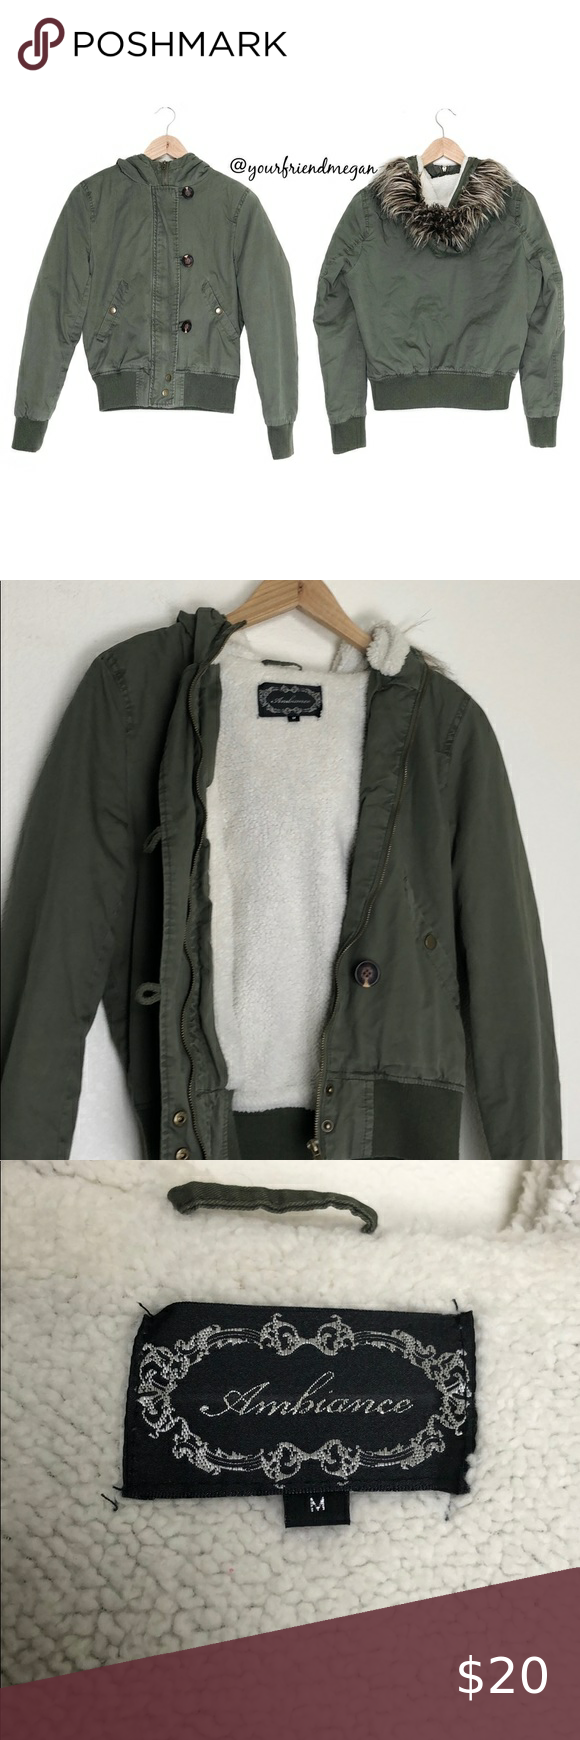 Ambiance Olive Fleece Lined Bomber Jacket Jackets Bomber Jacket Clothes Design [ 1740 x 580 Pixel ]